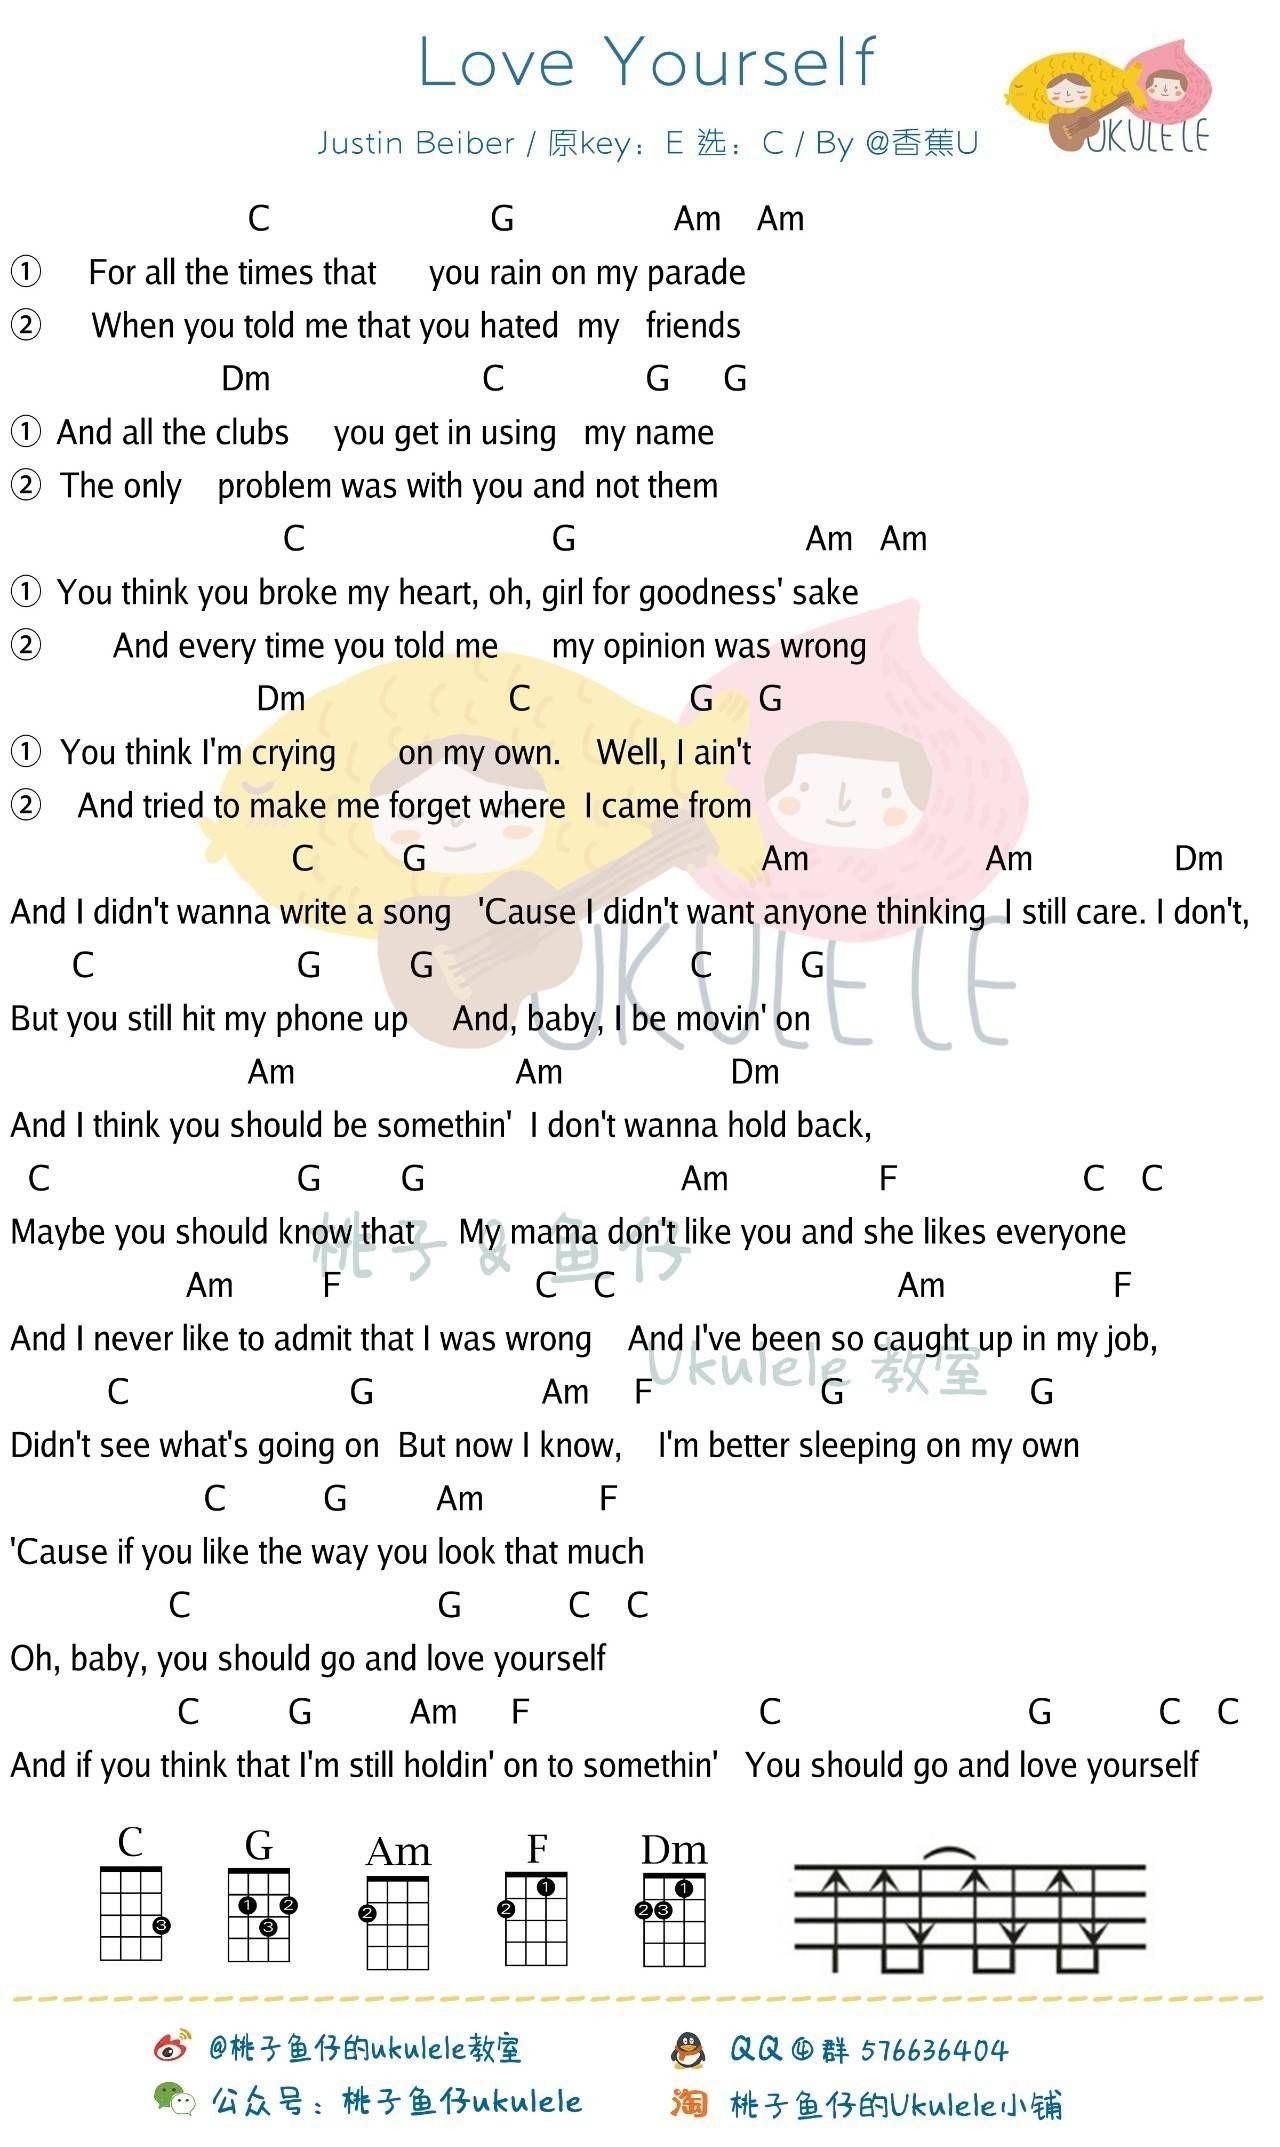 《Love Yourself》/Justin Beiber尤克里里譜分享-尤克里里吧 | Ukulele ...